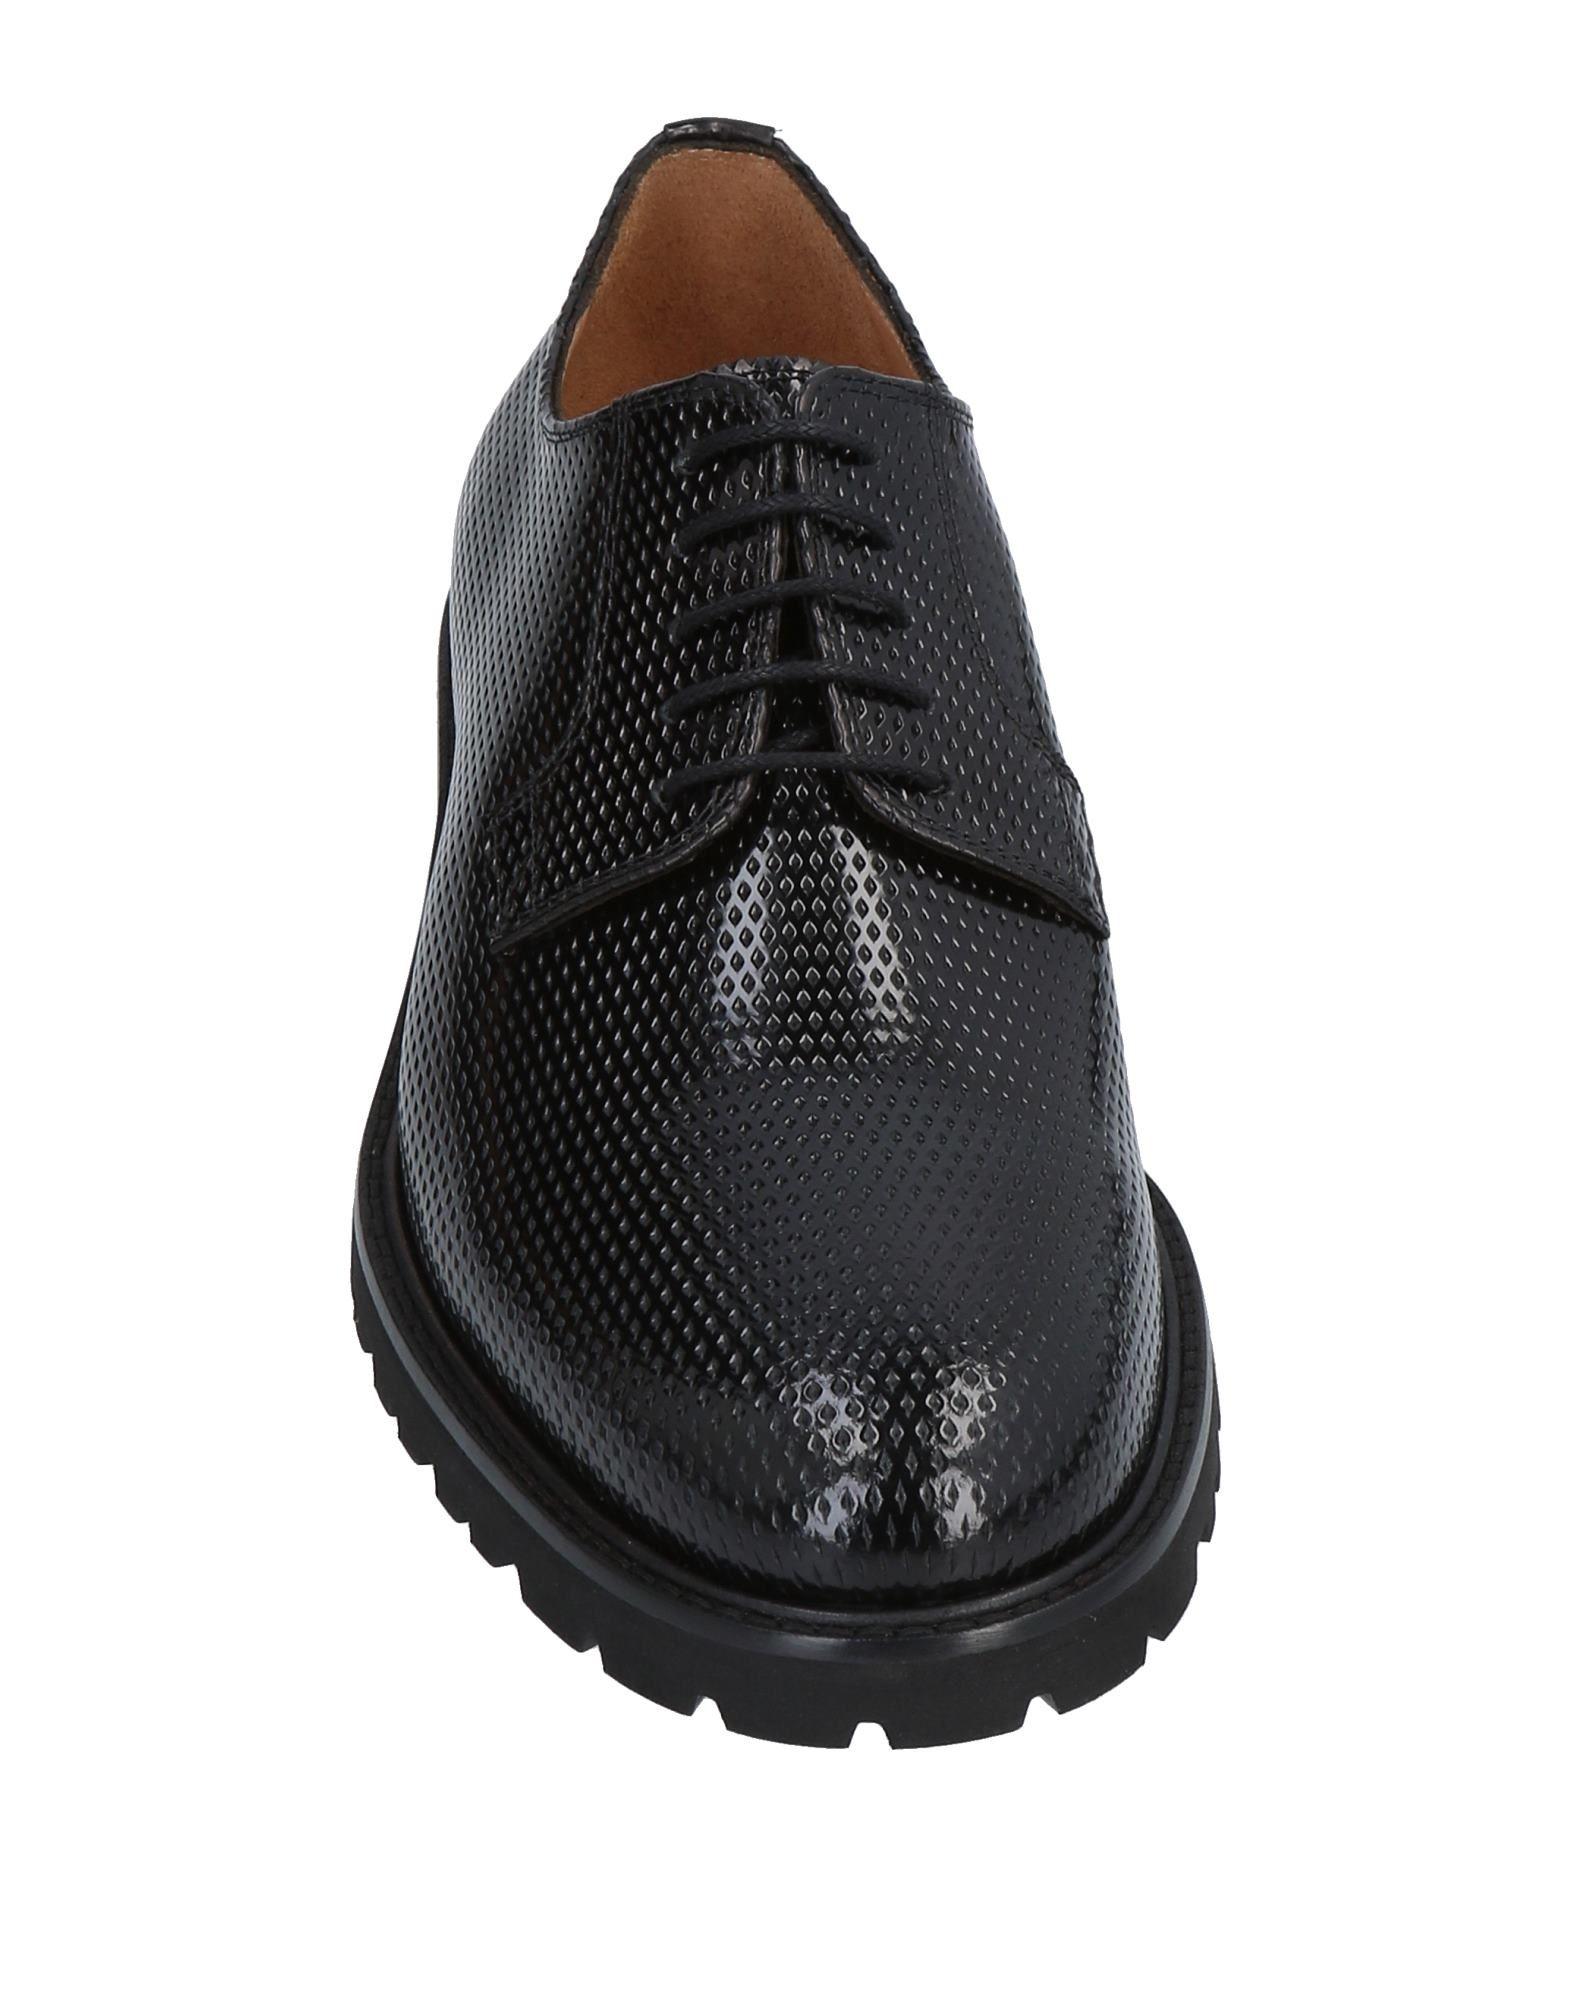 Zespà Schnürschuhe Herren beliebte  11472901MG Gute Qualität beliebte Herren Schuhe 8530ab